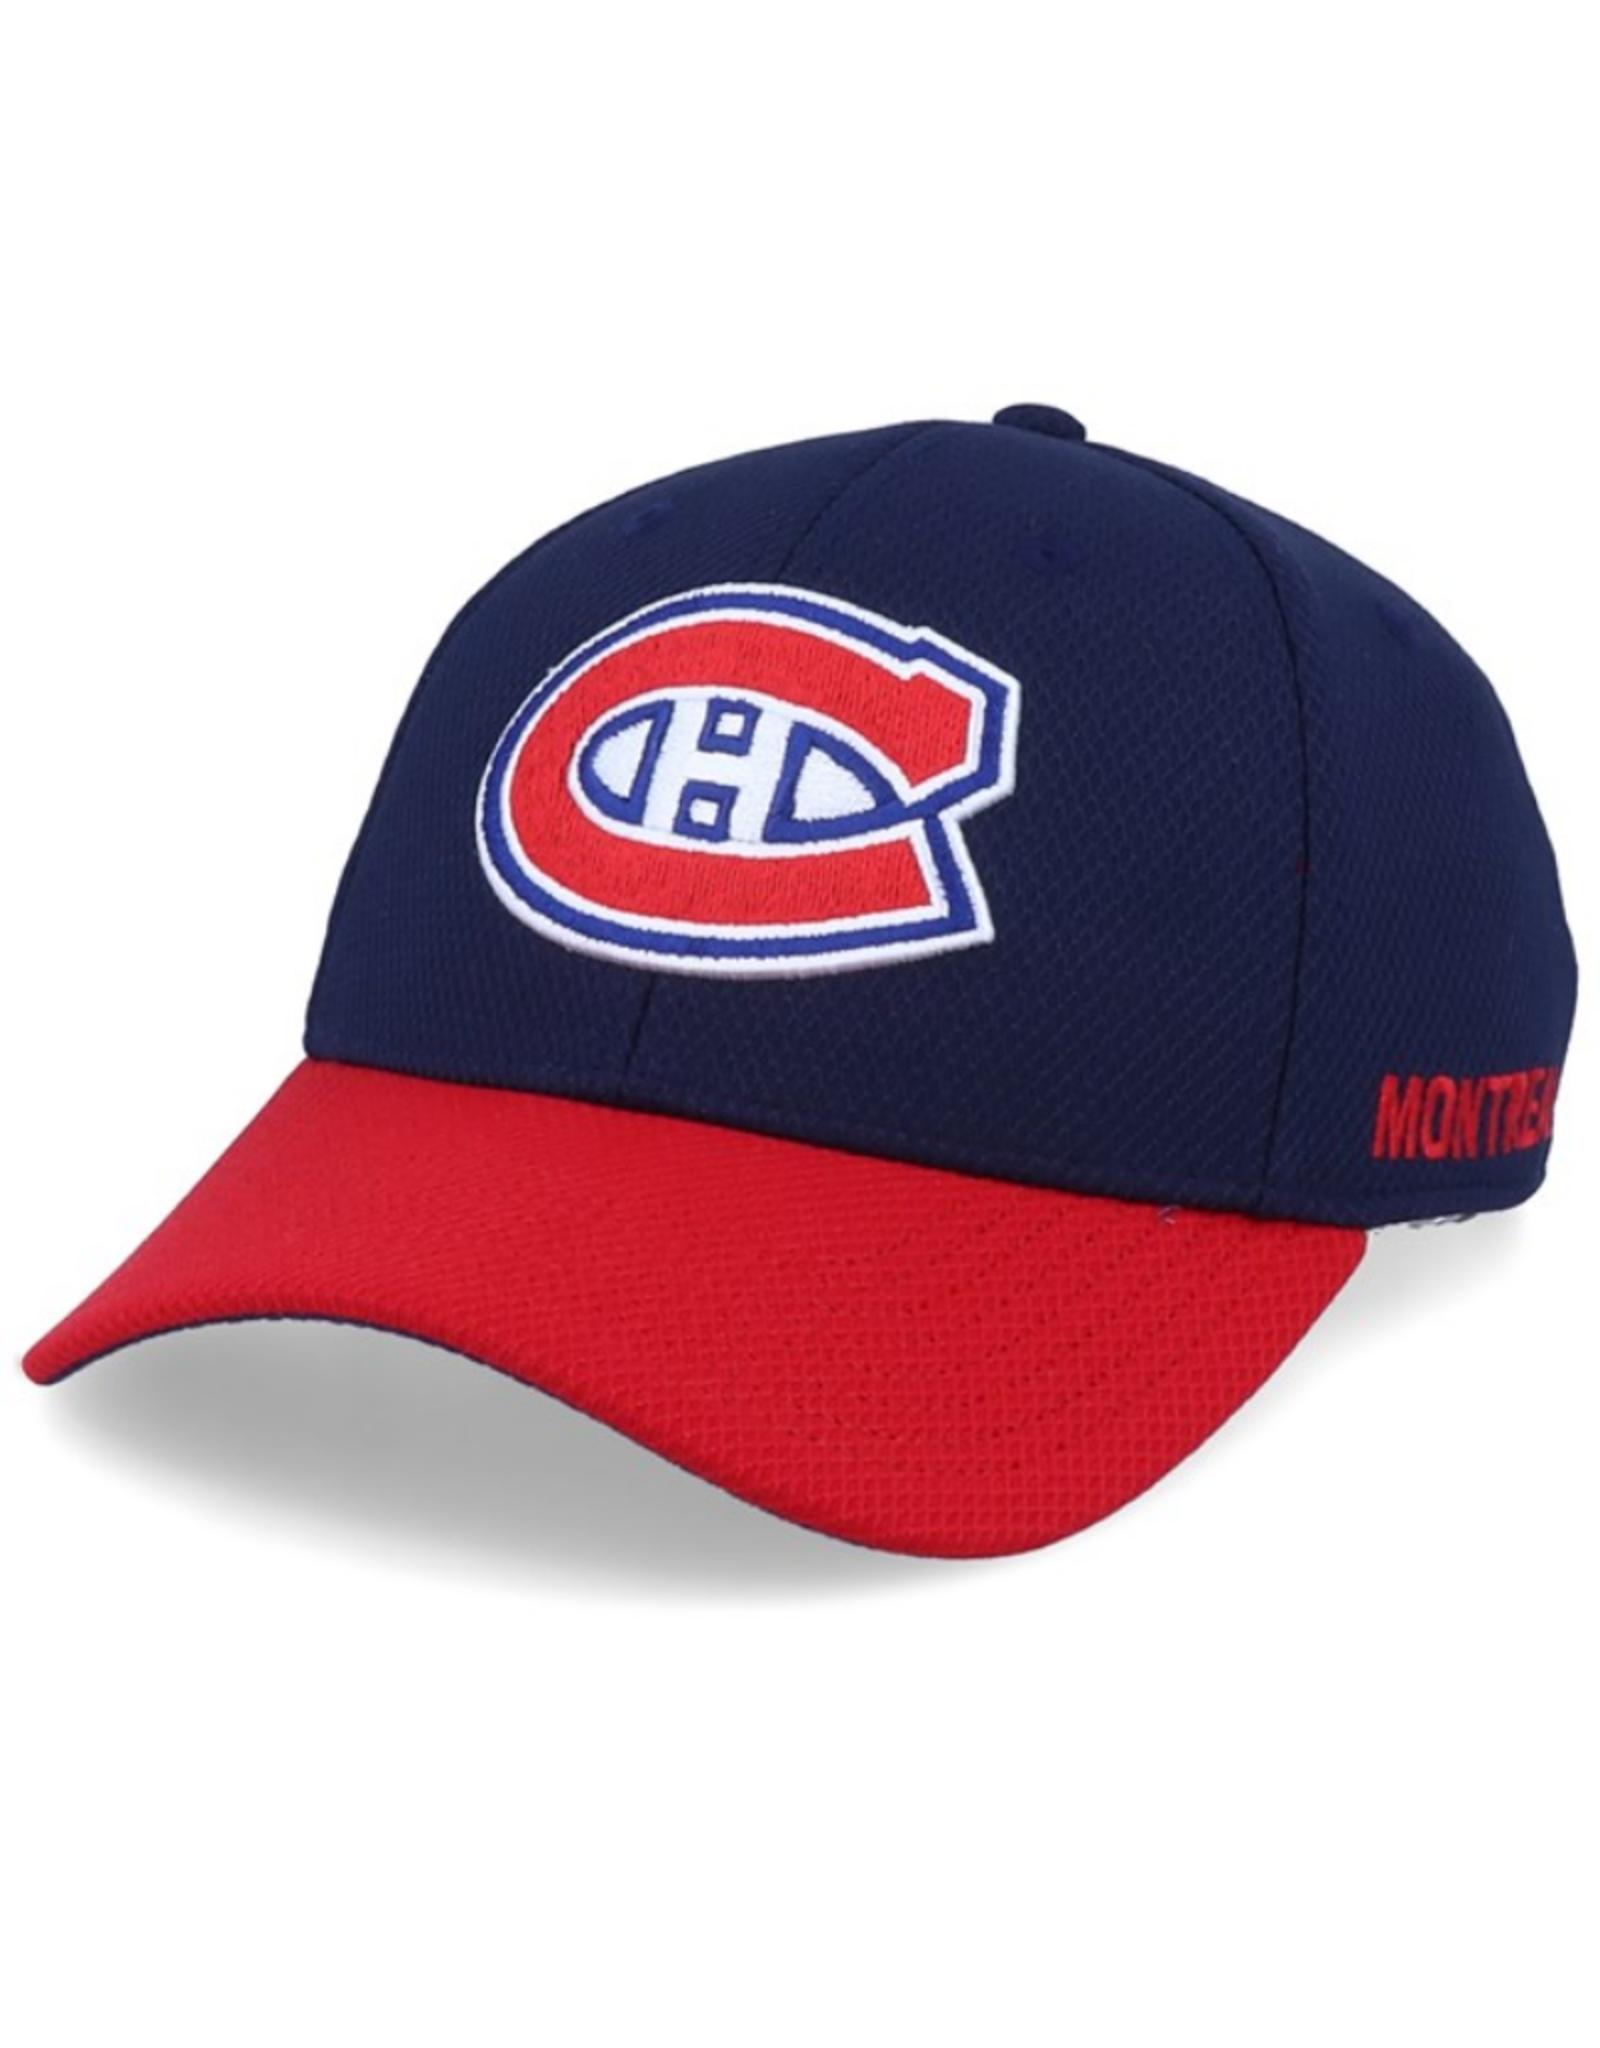 Adidas Adidas Men's Coach Left City Flex Hat Montreal Canadiens Navy